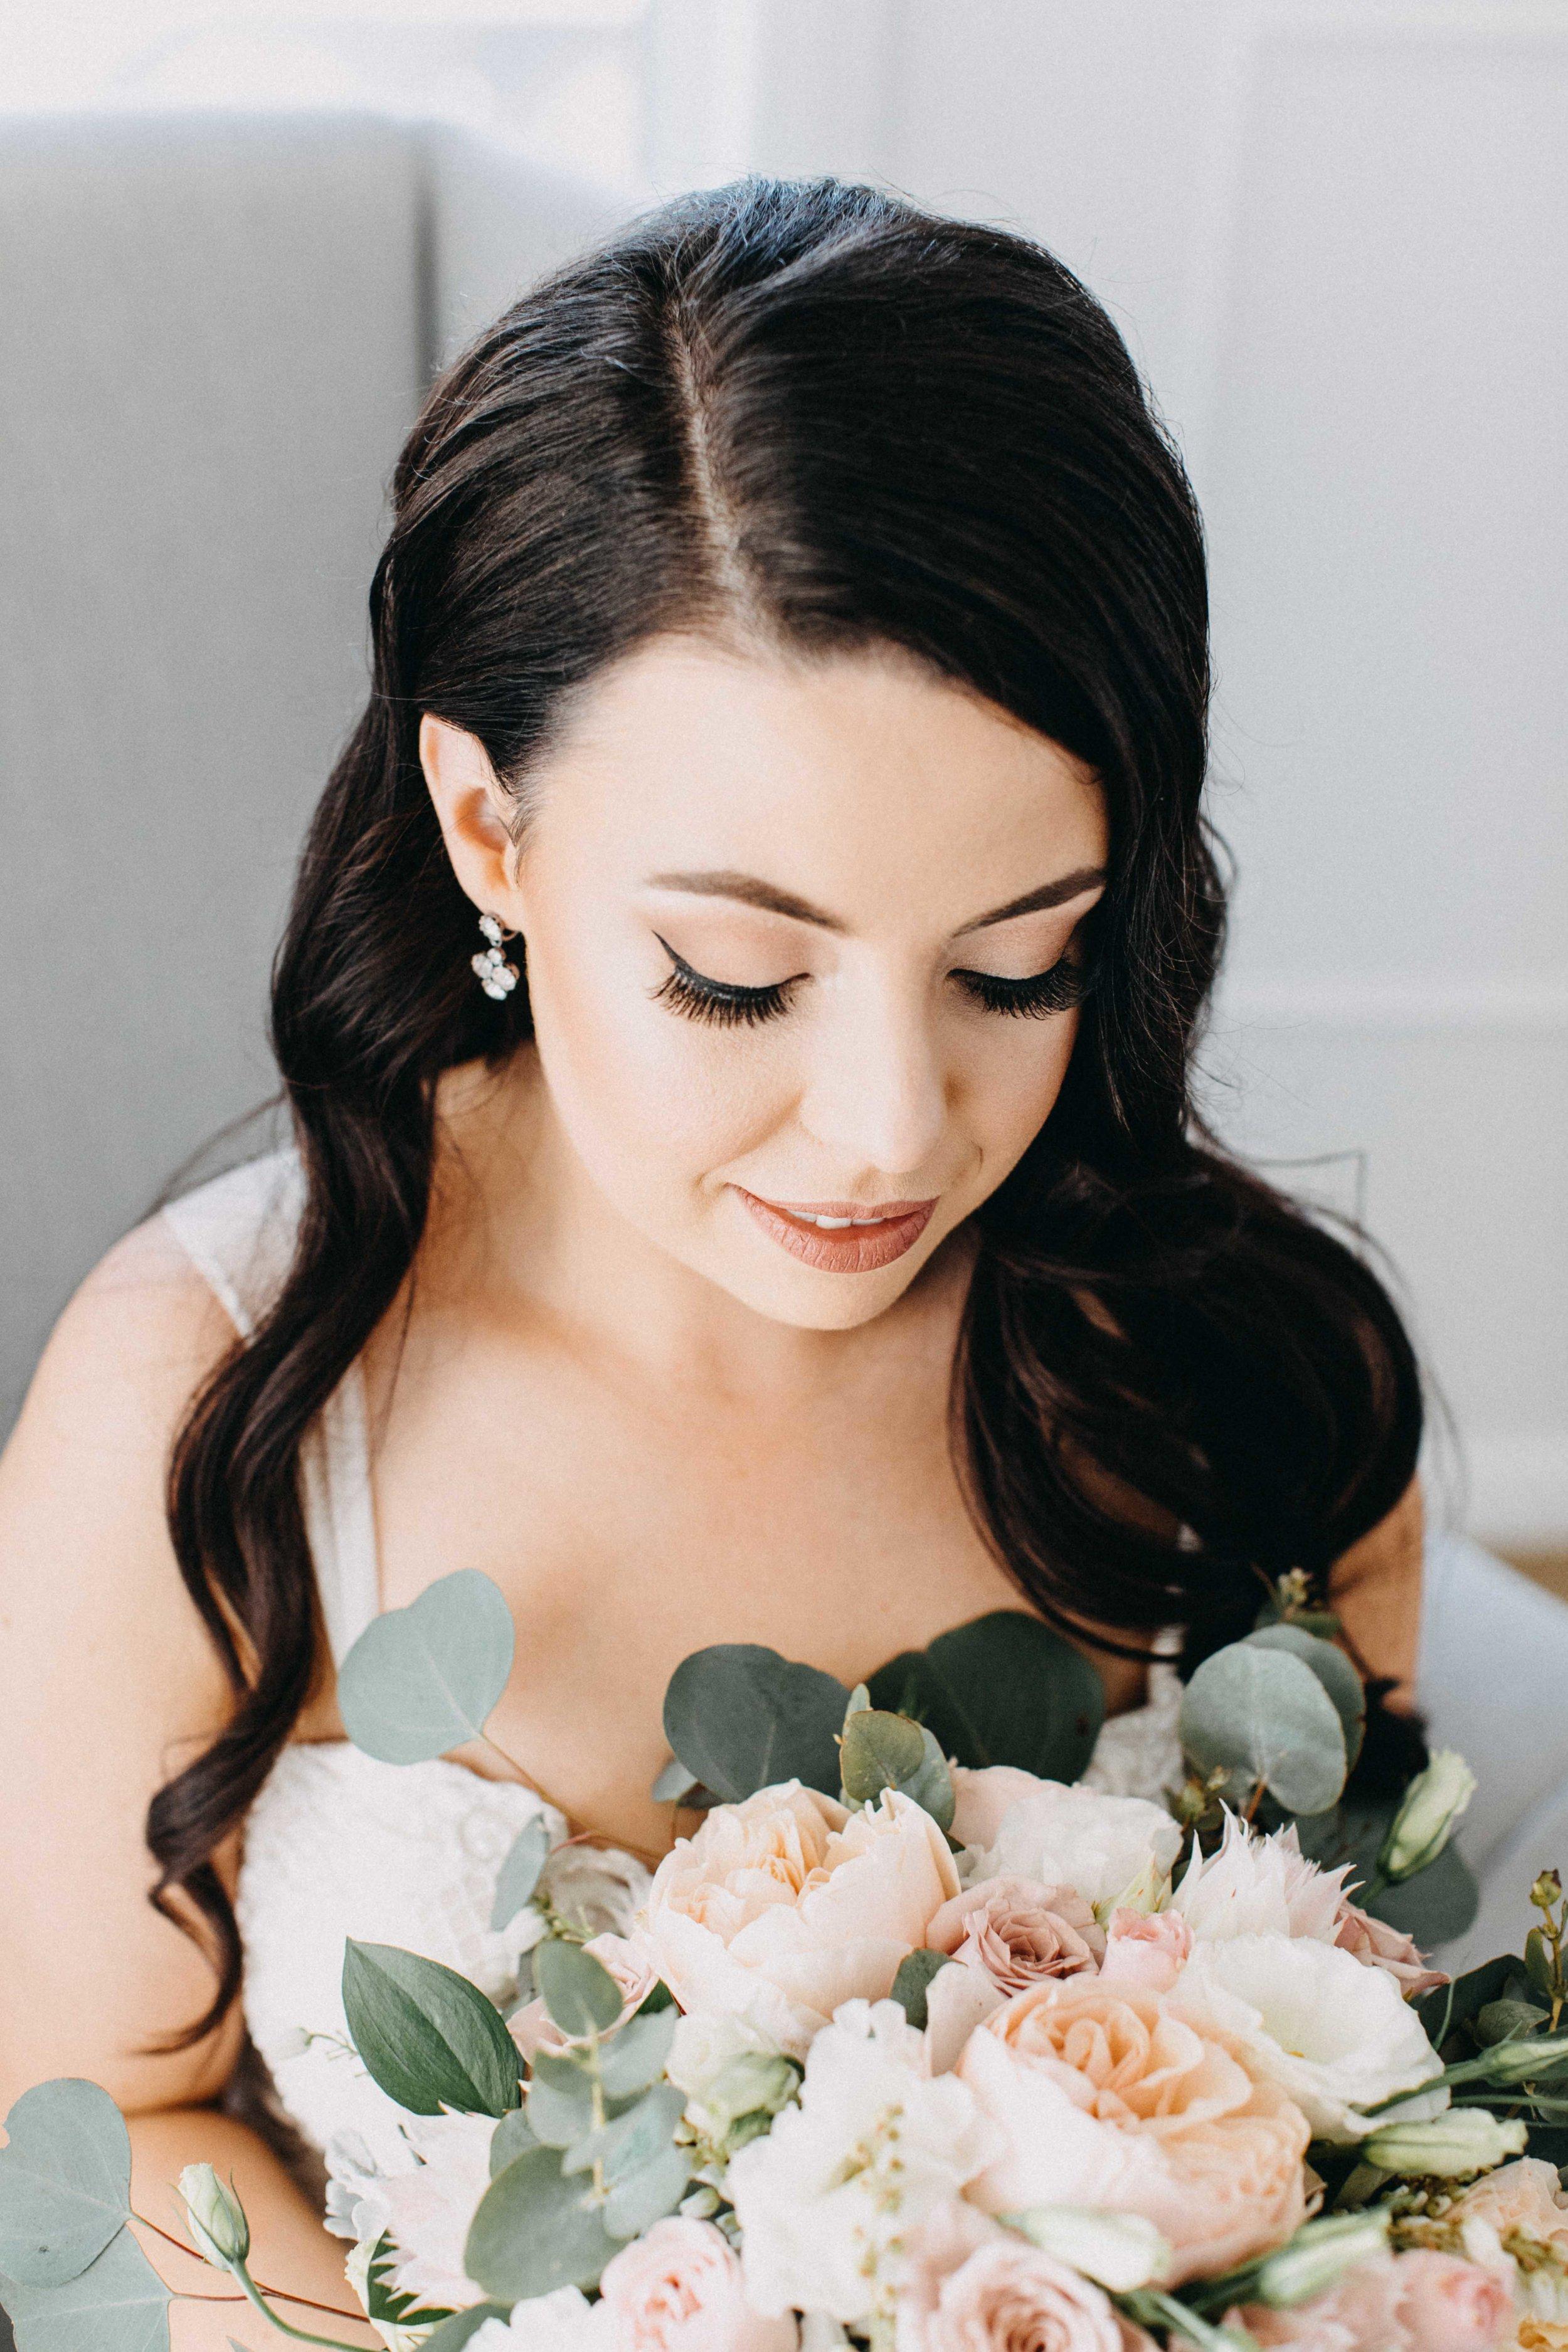 exeter-southern-highlands-wedding-www.emilyobrienphotography.net -47.jpg